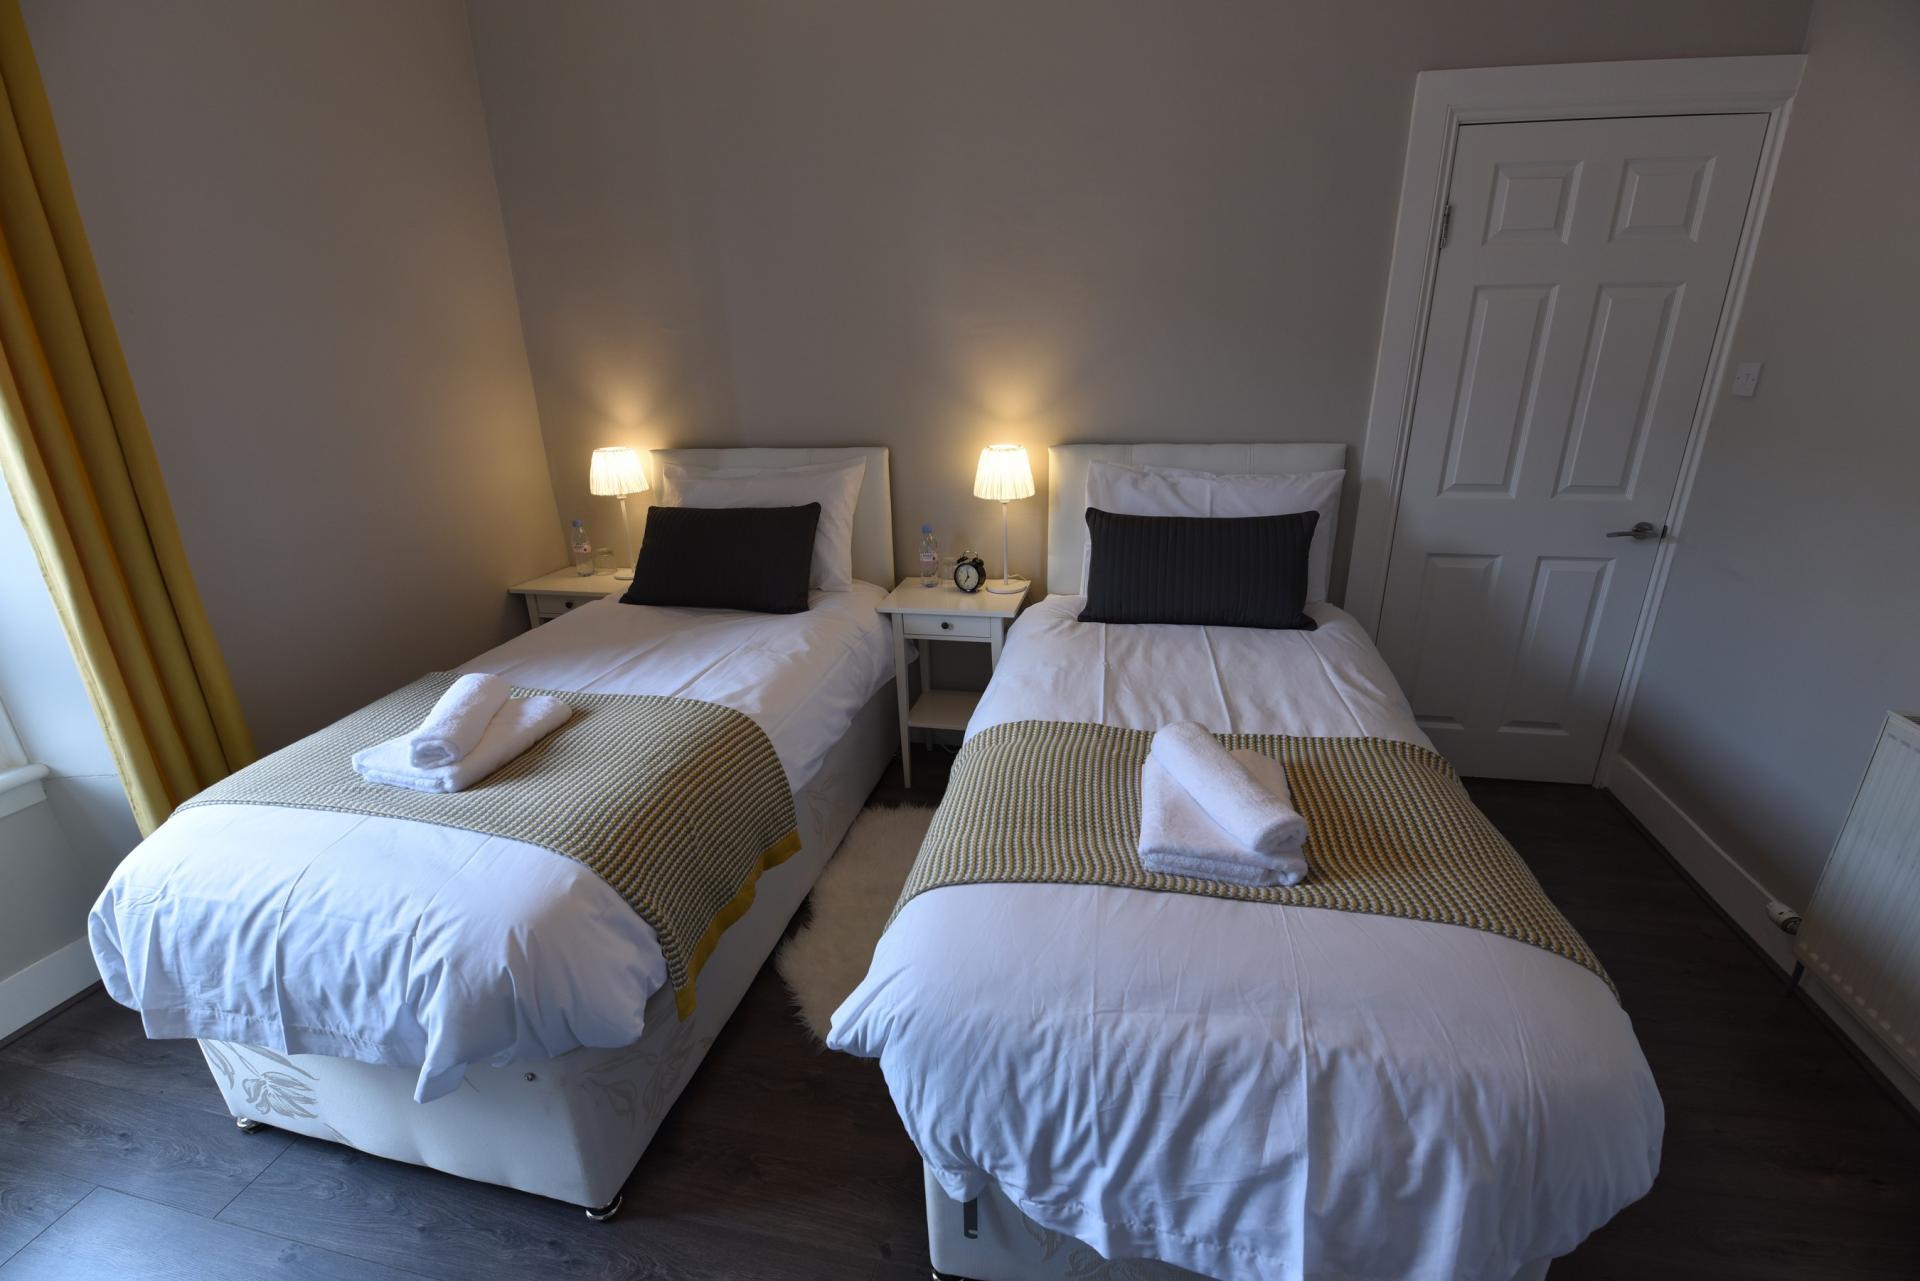 Twin beds at Meadowbank House Apartment, Jock's Lodge, Edinburgh - Citybase Apartments